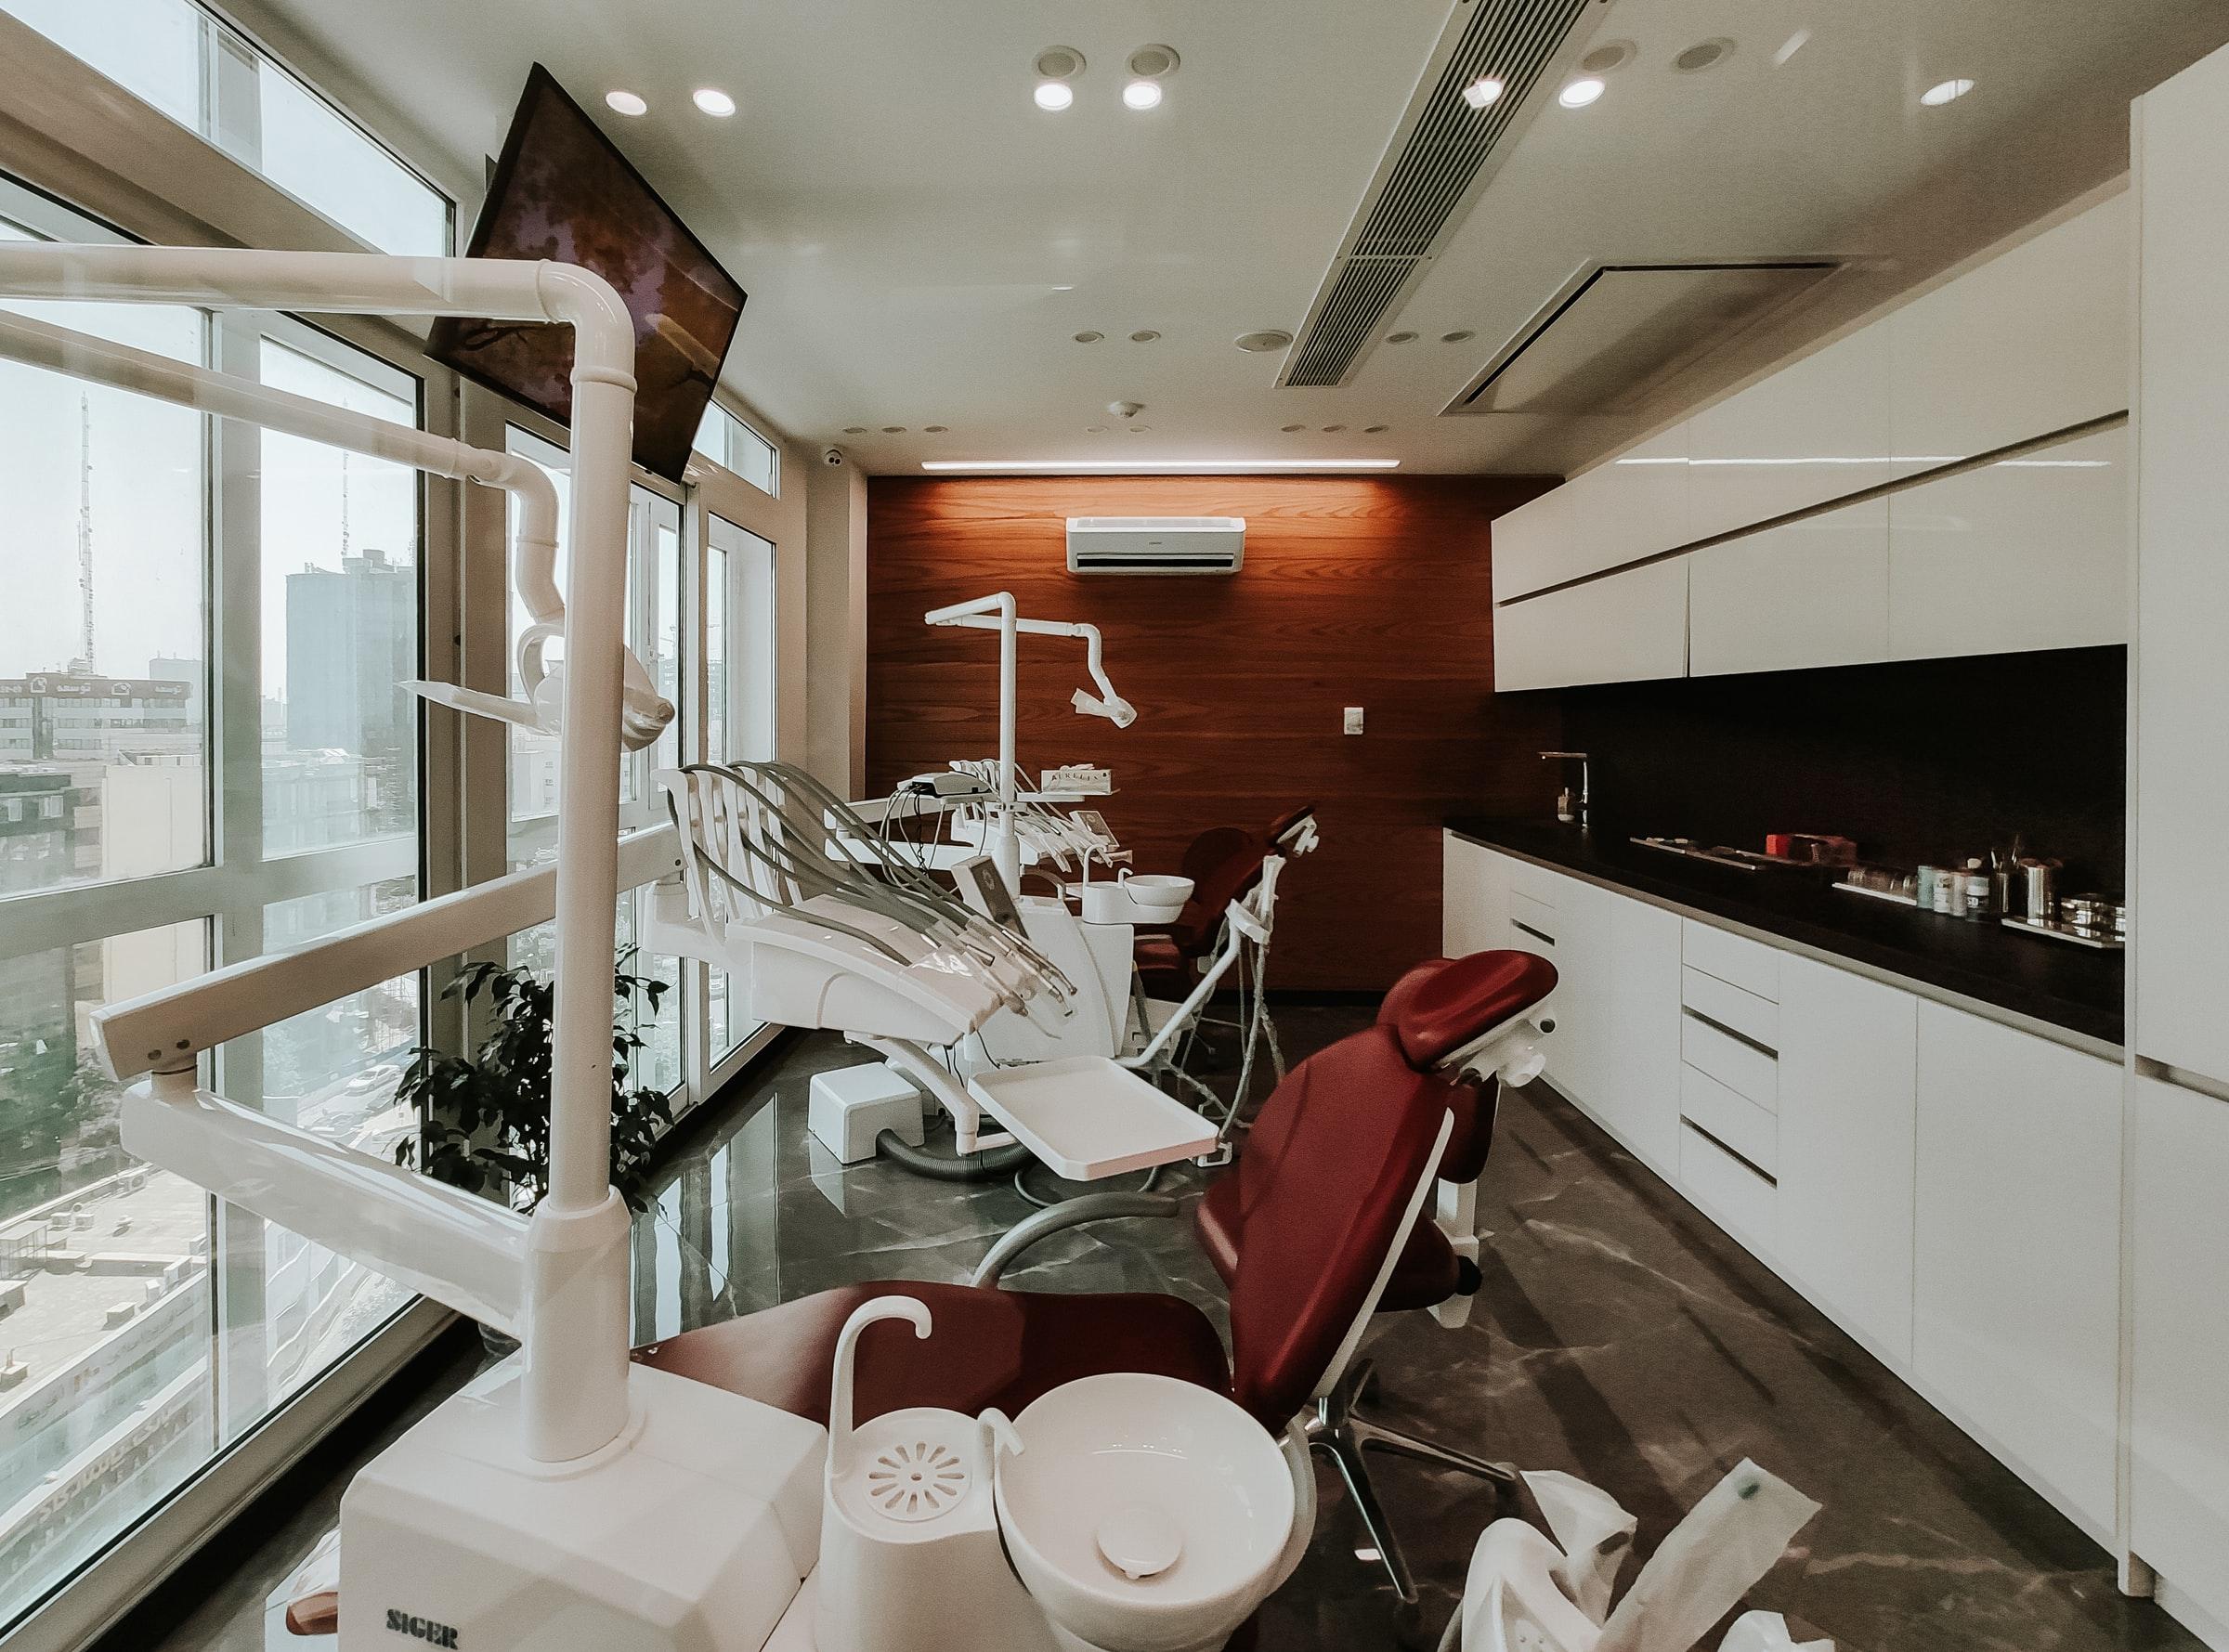 Best Teeth Whitening methods at the Montclair Family Dentistry